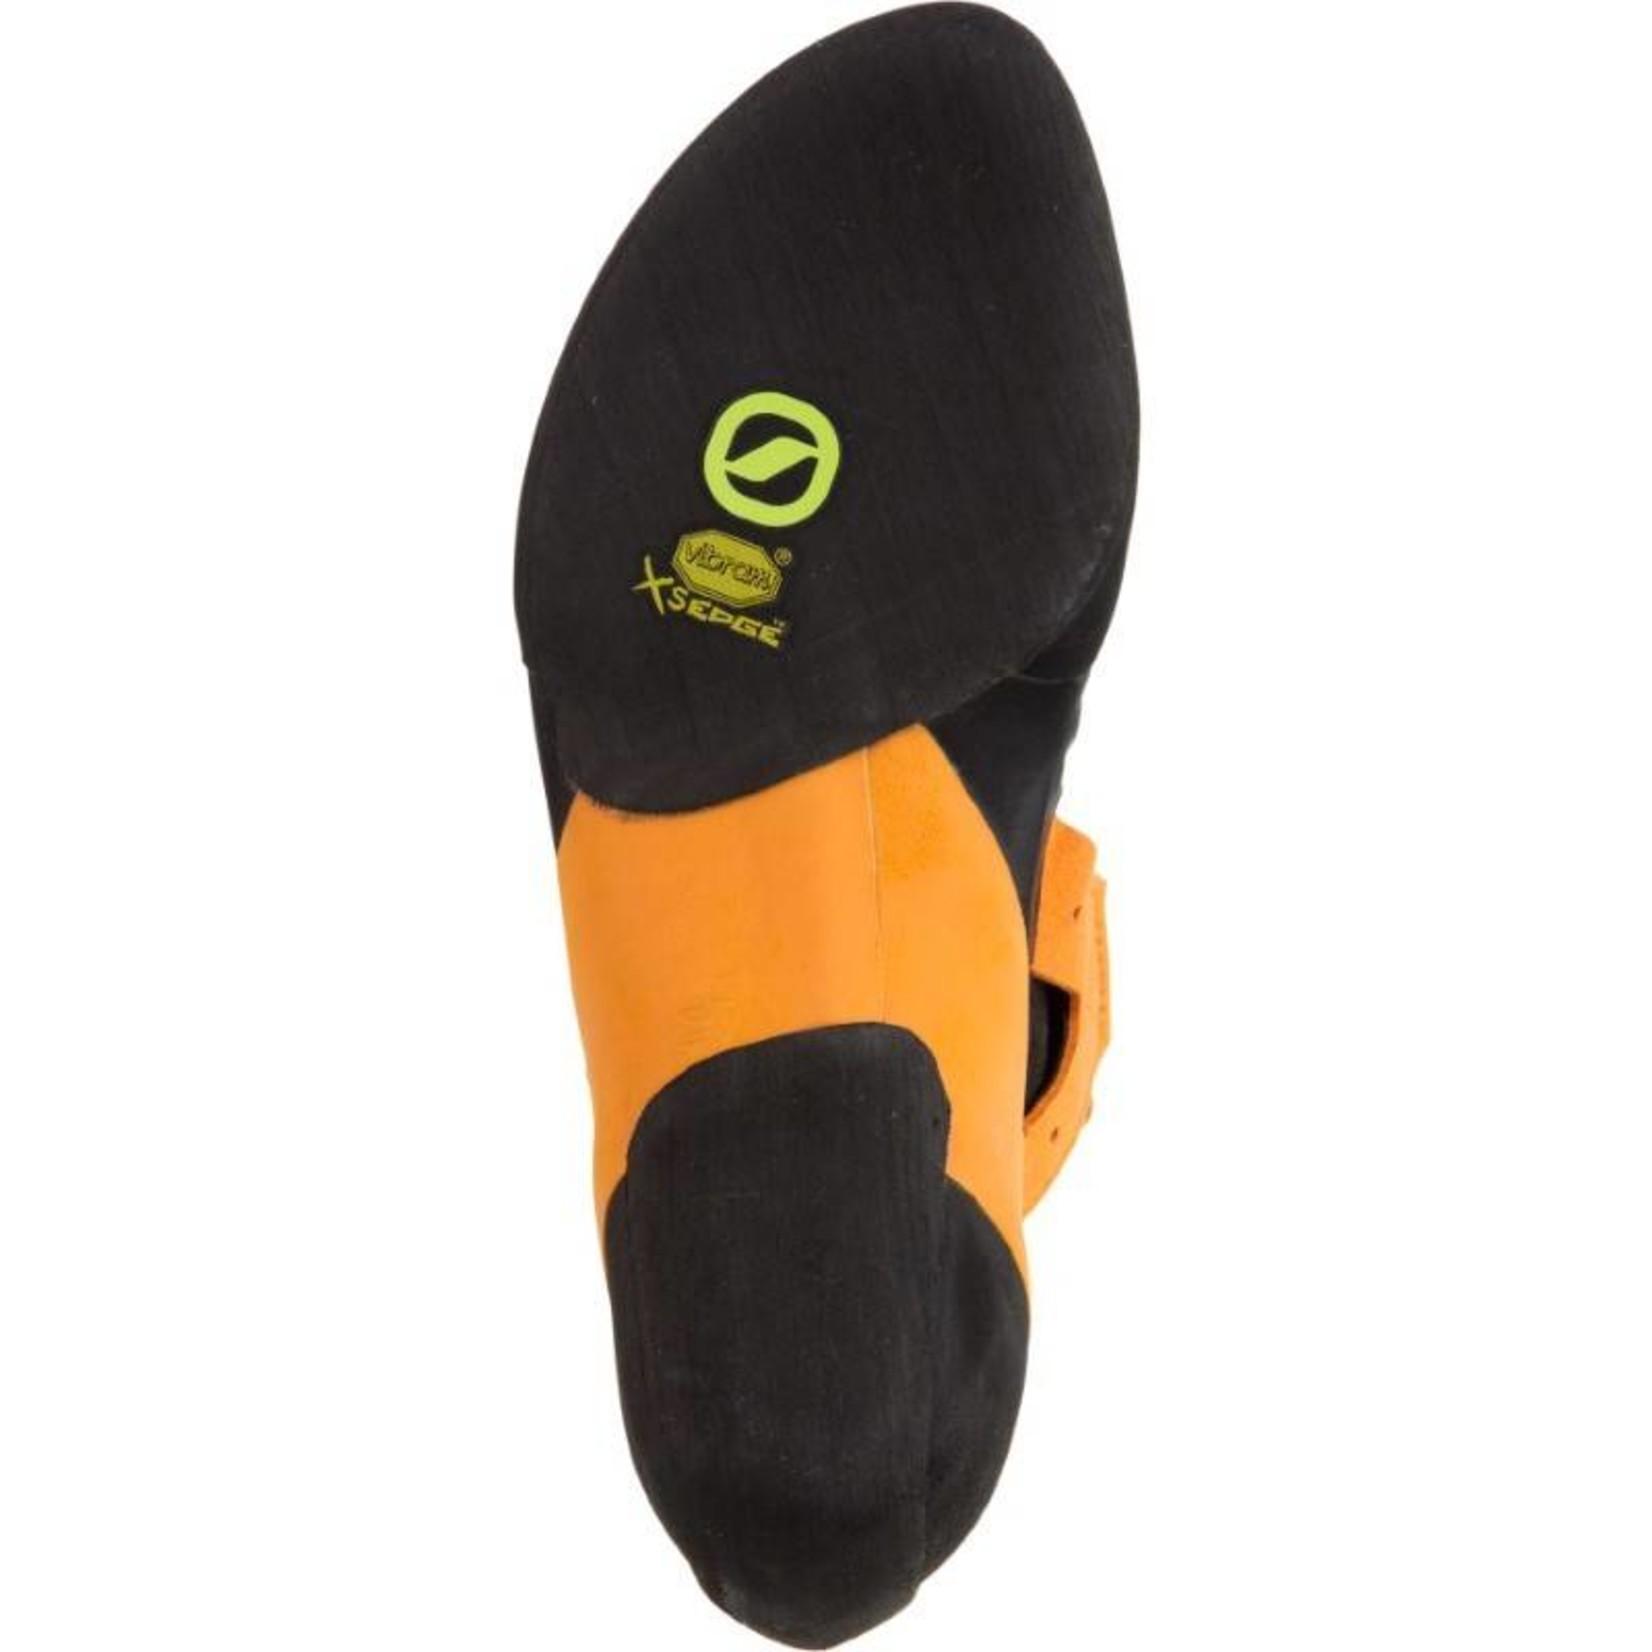 Scarpa Scarpa Instinct VS Climbing Shoe